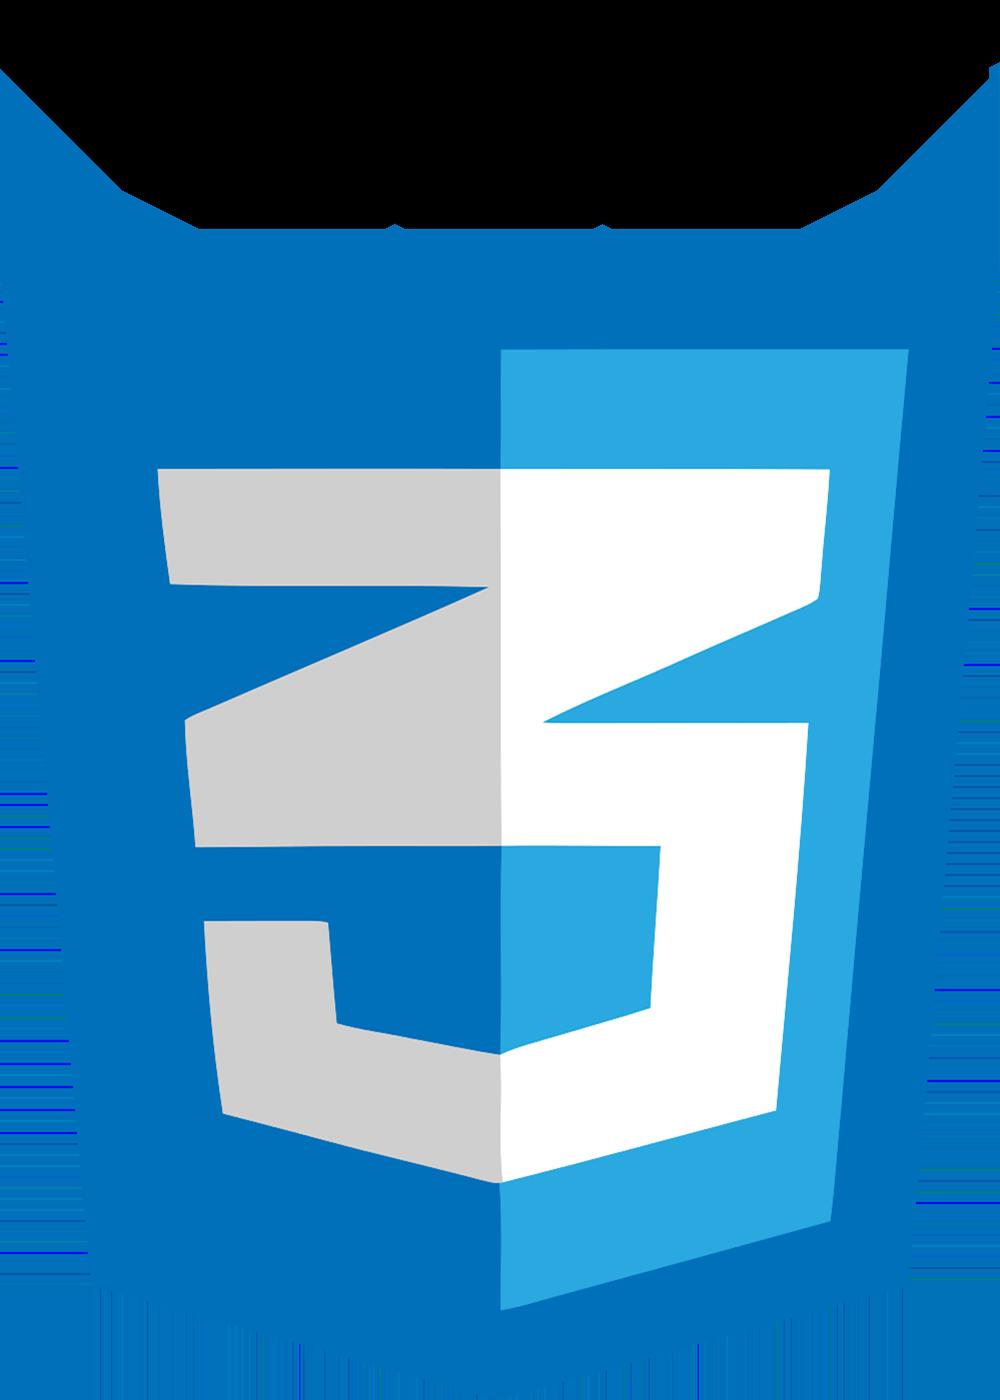 CSS3 Certification